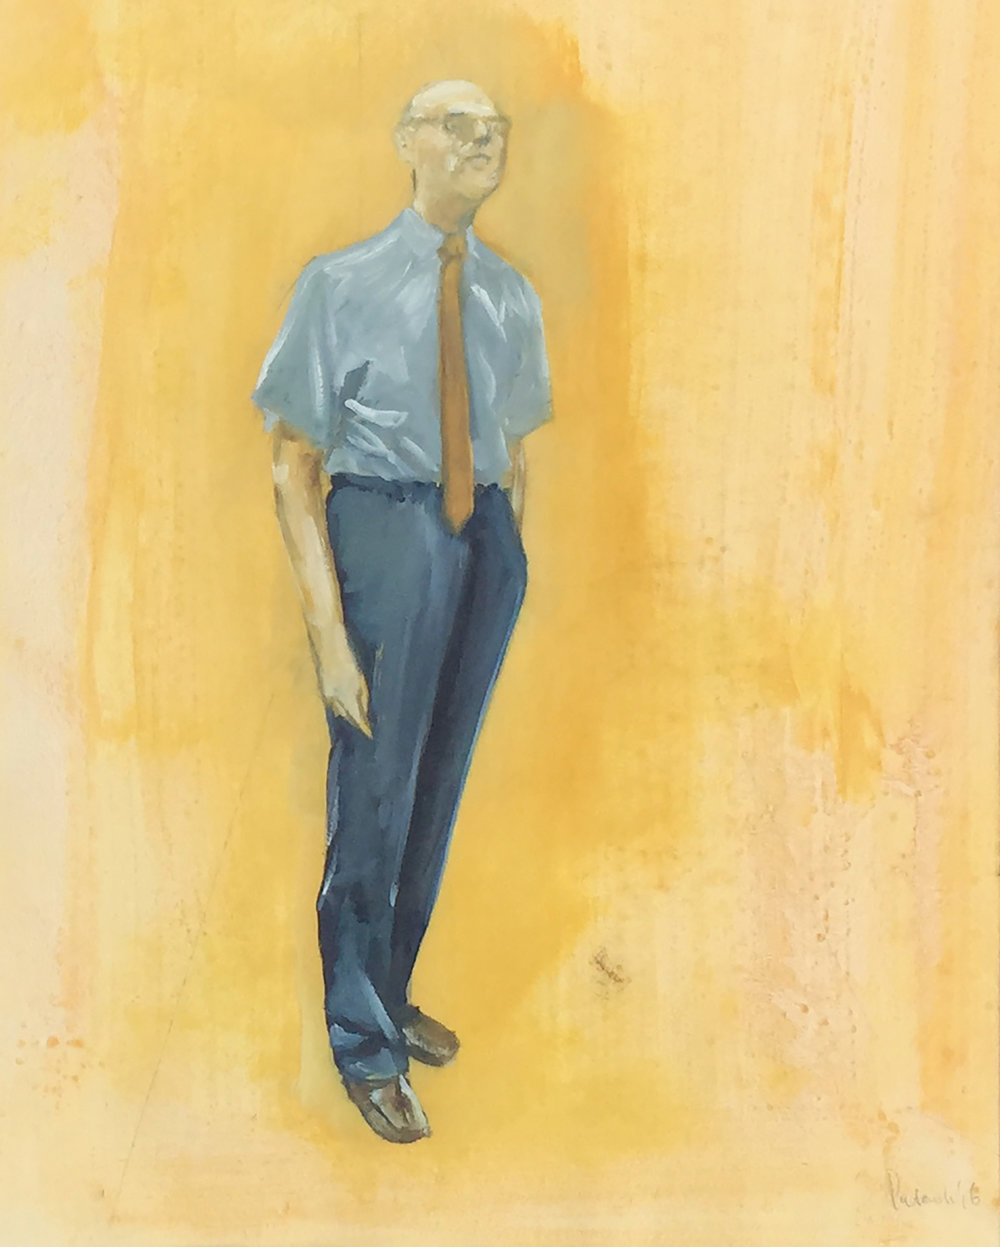 Belgian Man, Mixed media on paper, 52 x 72 cm, 2016